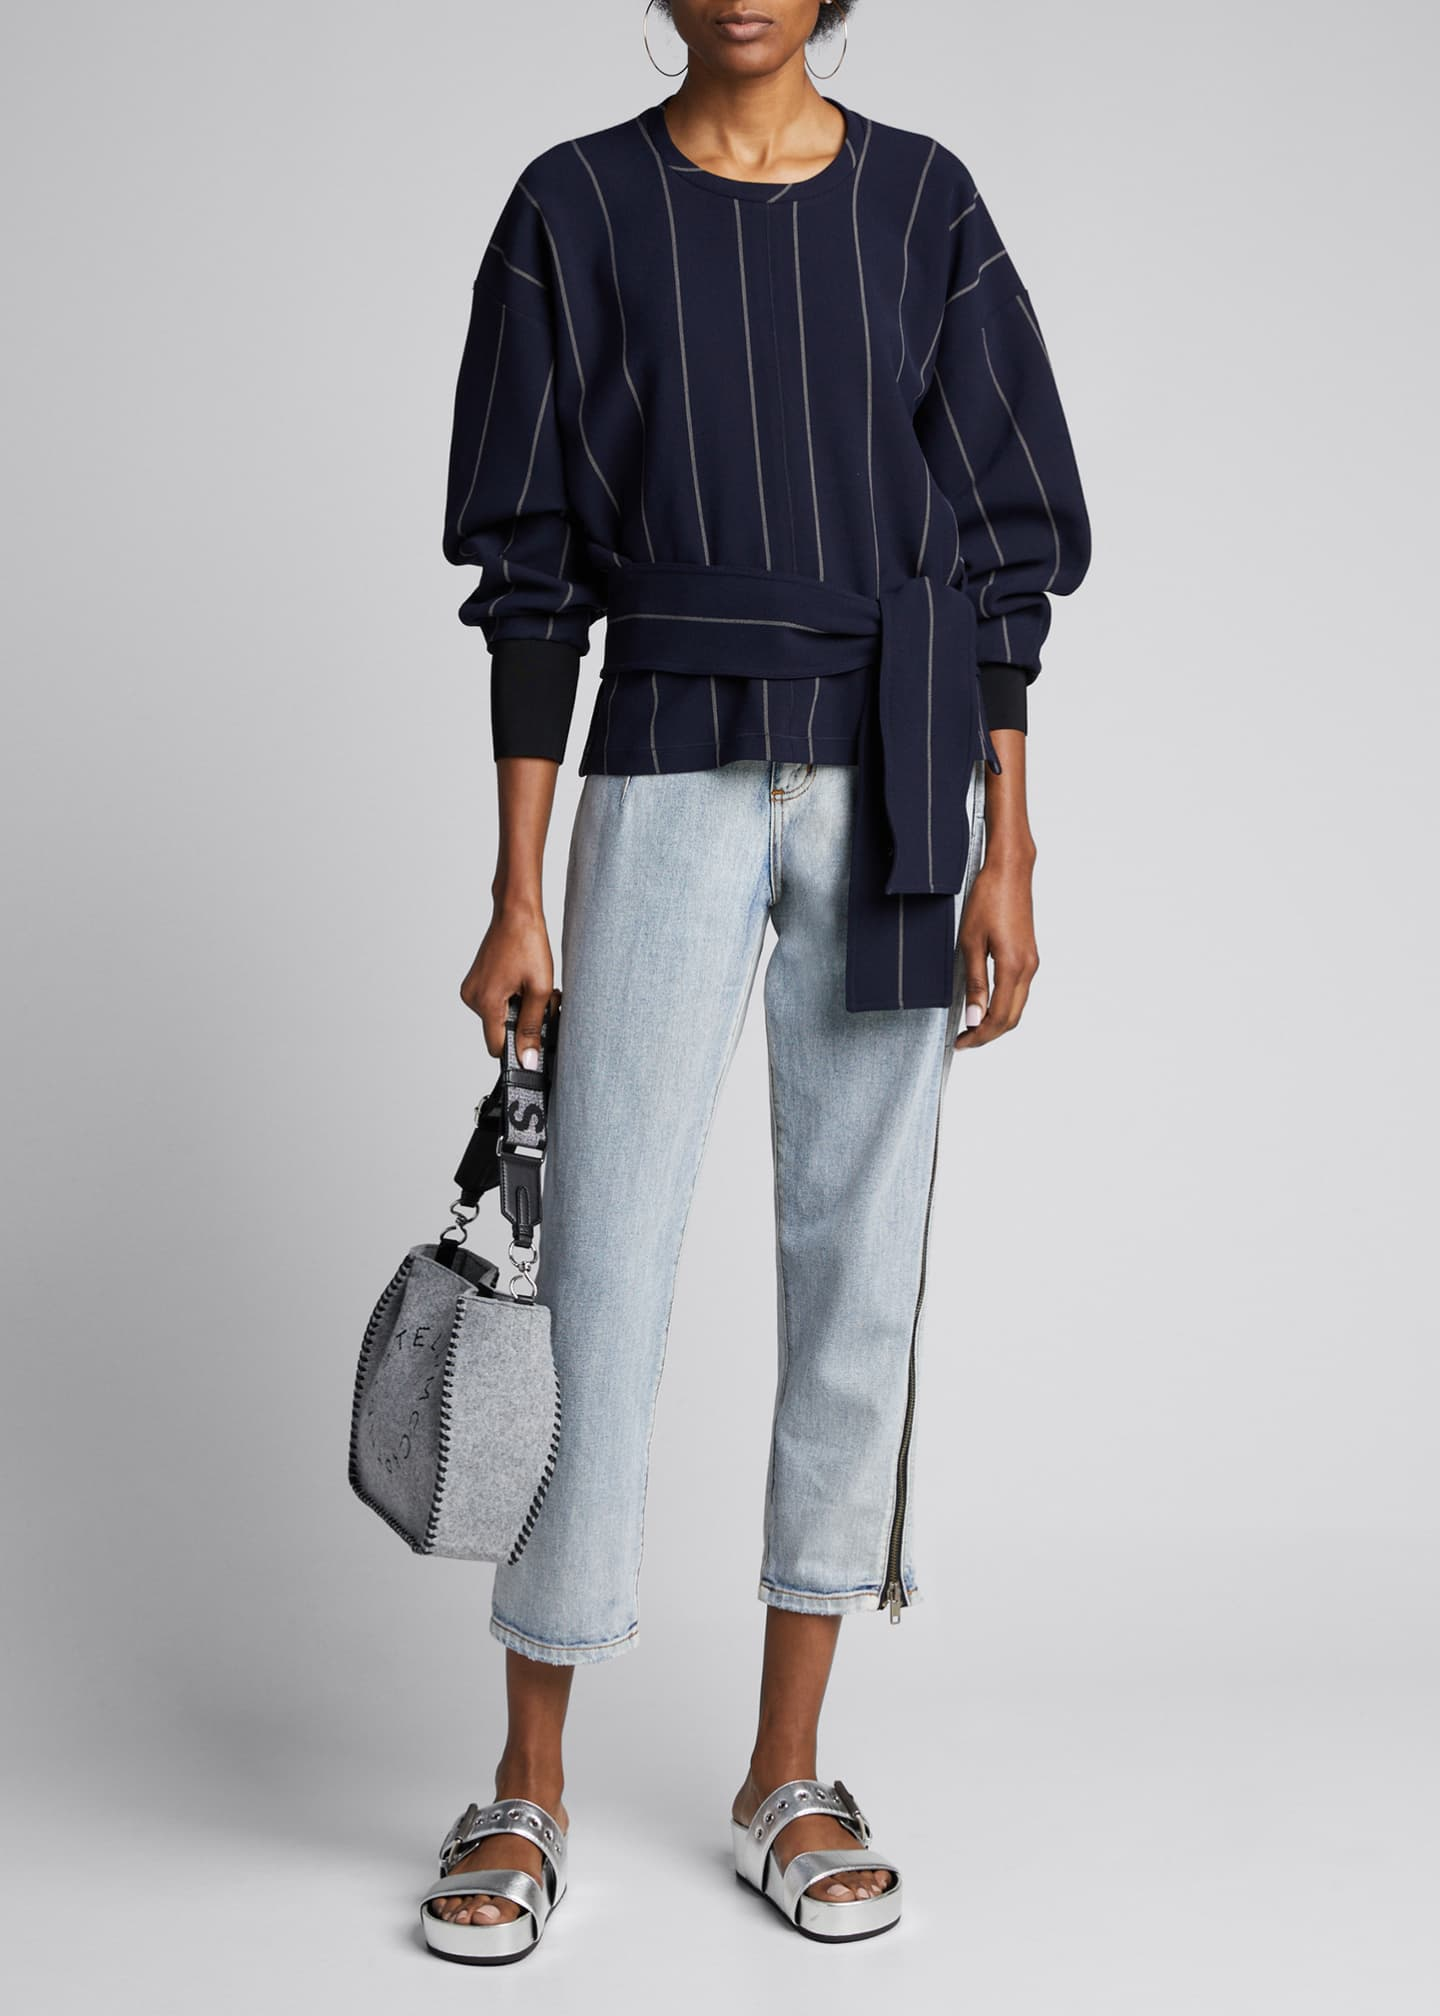 3.1 Phillip Lim Long-Sleeve Striped Pullover w/ Belt